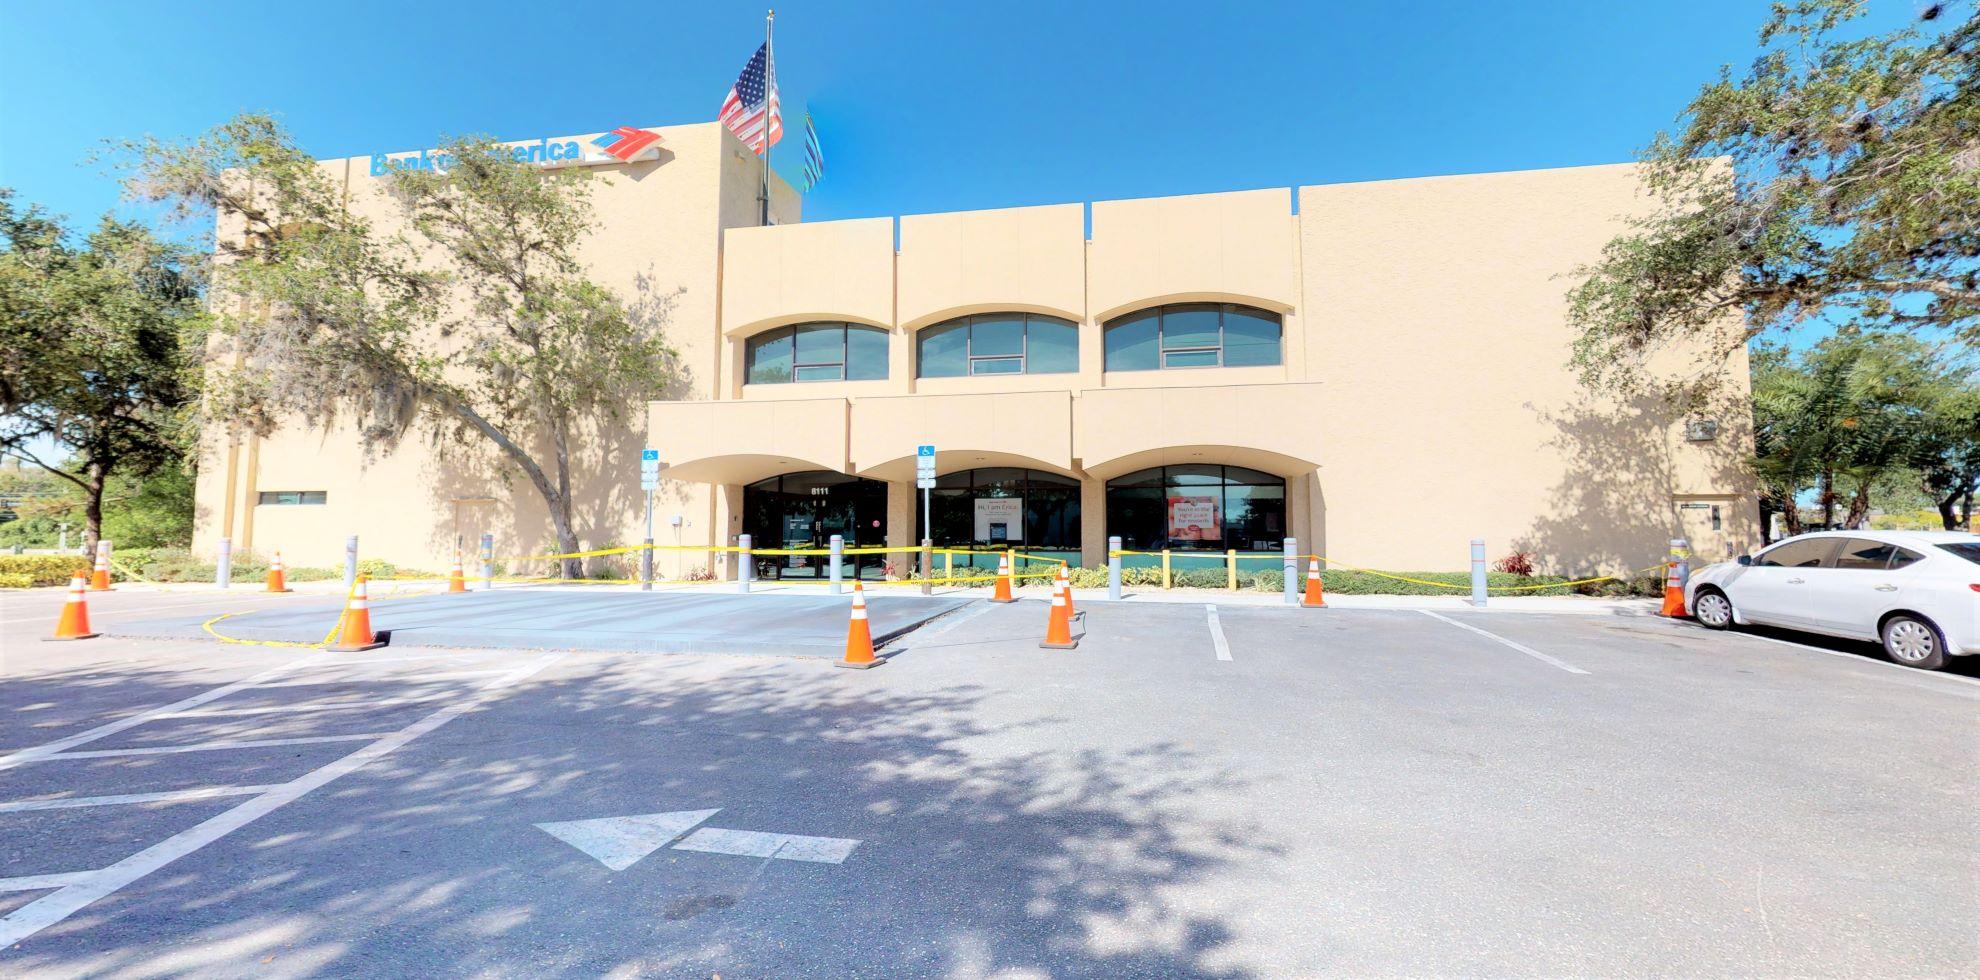 Bank of America financial center with drive-thru ATM   8111 S Beneva Rd, Sarasota, FL 34238